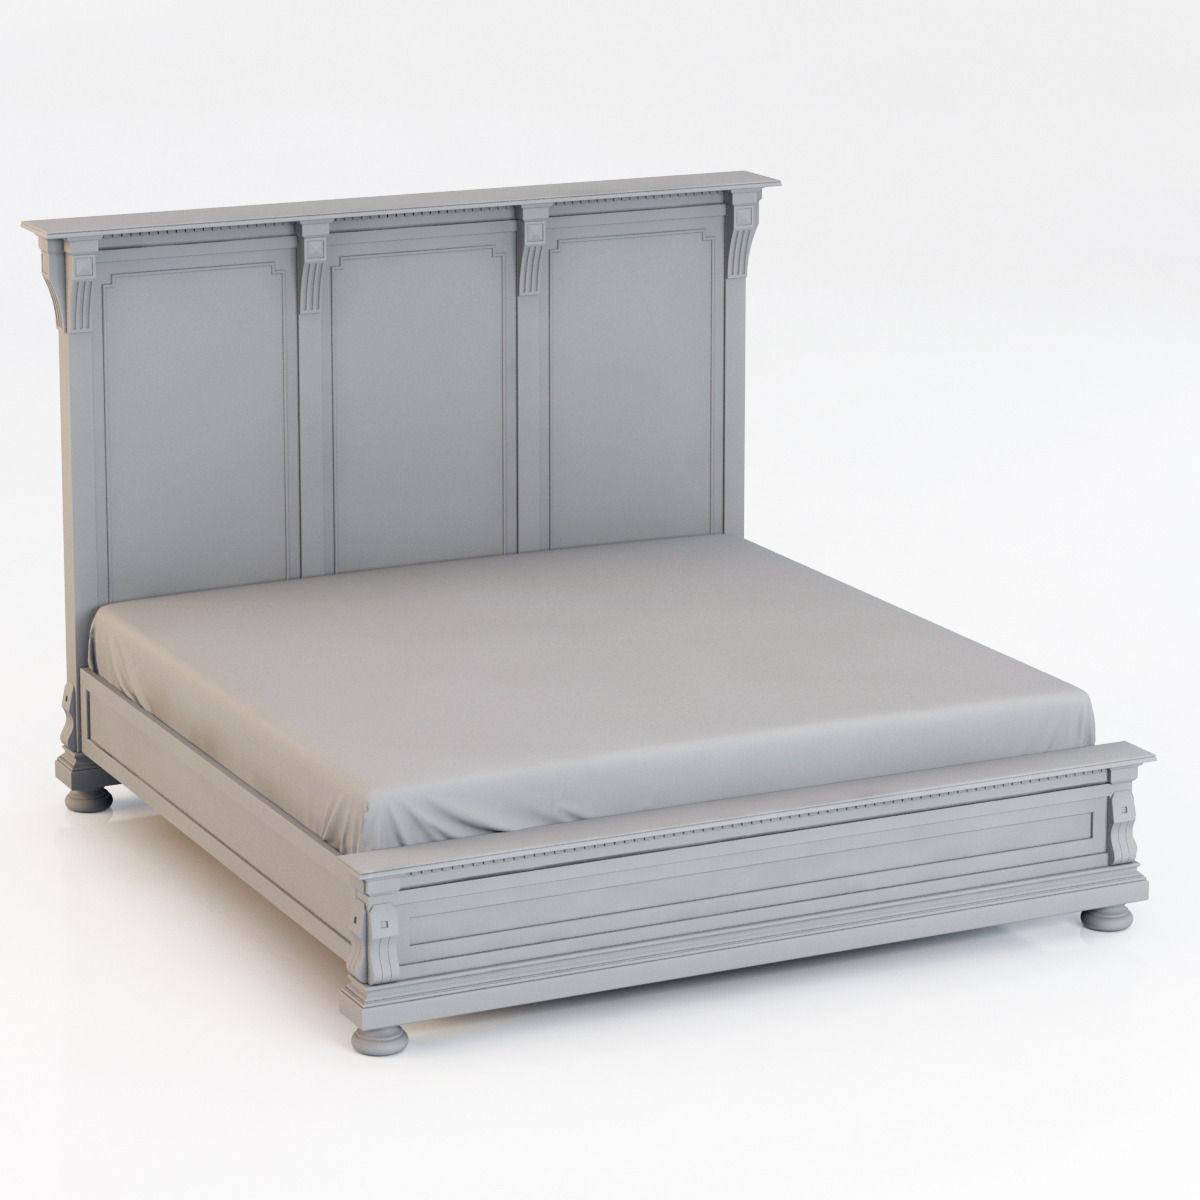 Restoration Hardware St James King Bed Without Footboard 3d Model Max  10